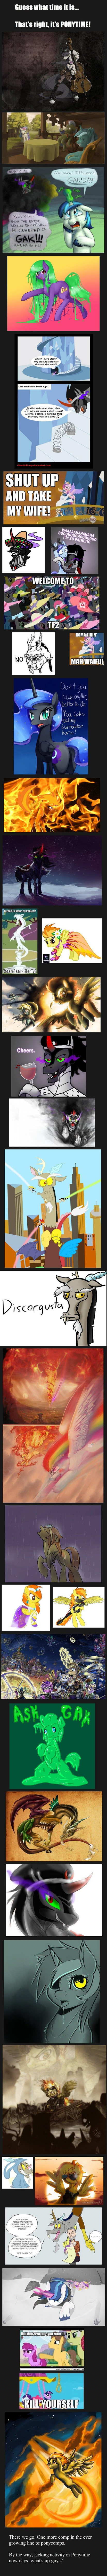 Ponycomp 209. Ponycomp 208: /channel/ponytime/Ponycomp+208/mTtiGzG/ DOWNLOAD LINK: docs.google.com/folder/d/0B4SOCzXHPRD..... You gotta love a Sheogorath and Discord Crossover. My Little Pony ponies ponytime